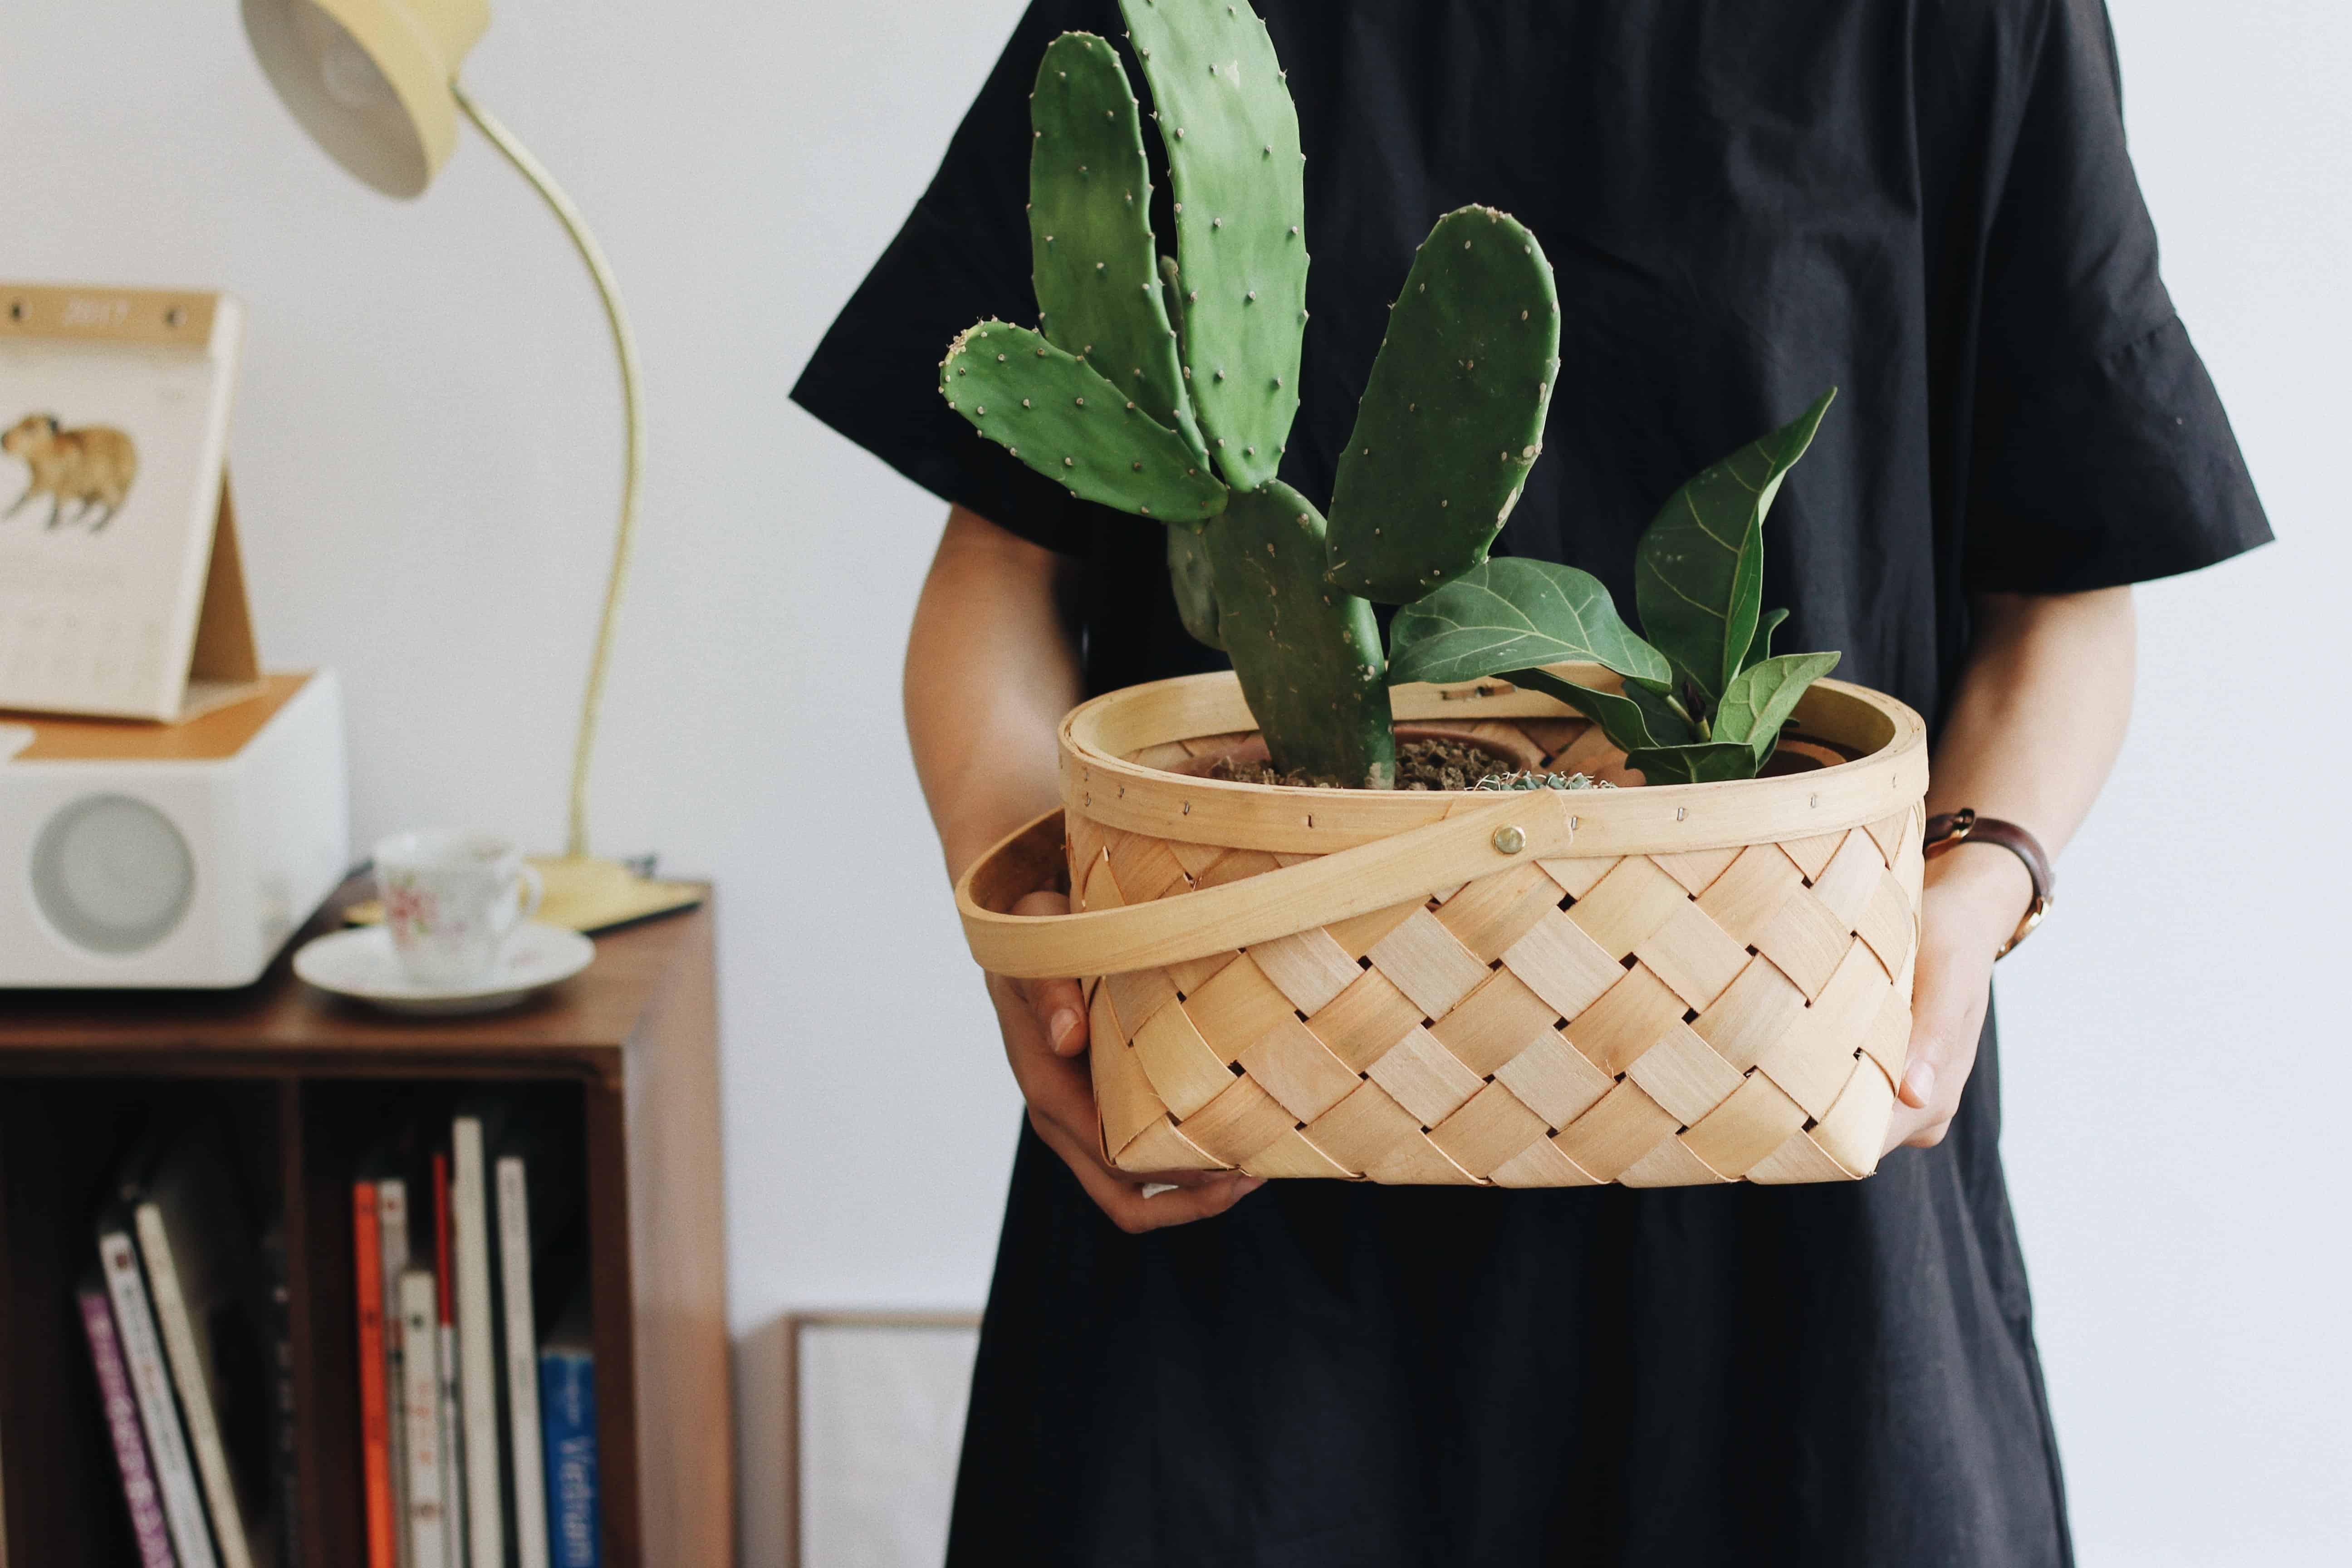 holding cactus plant